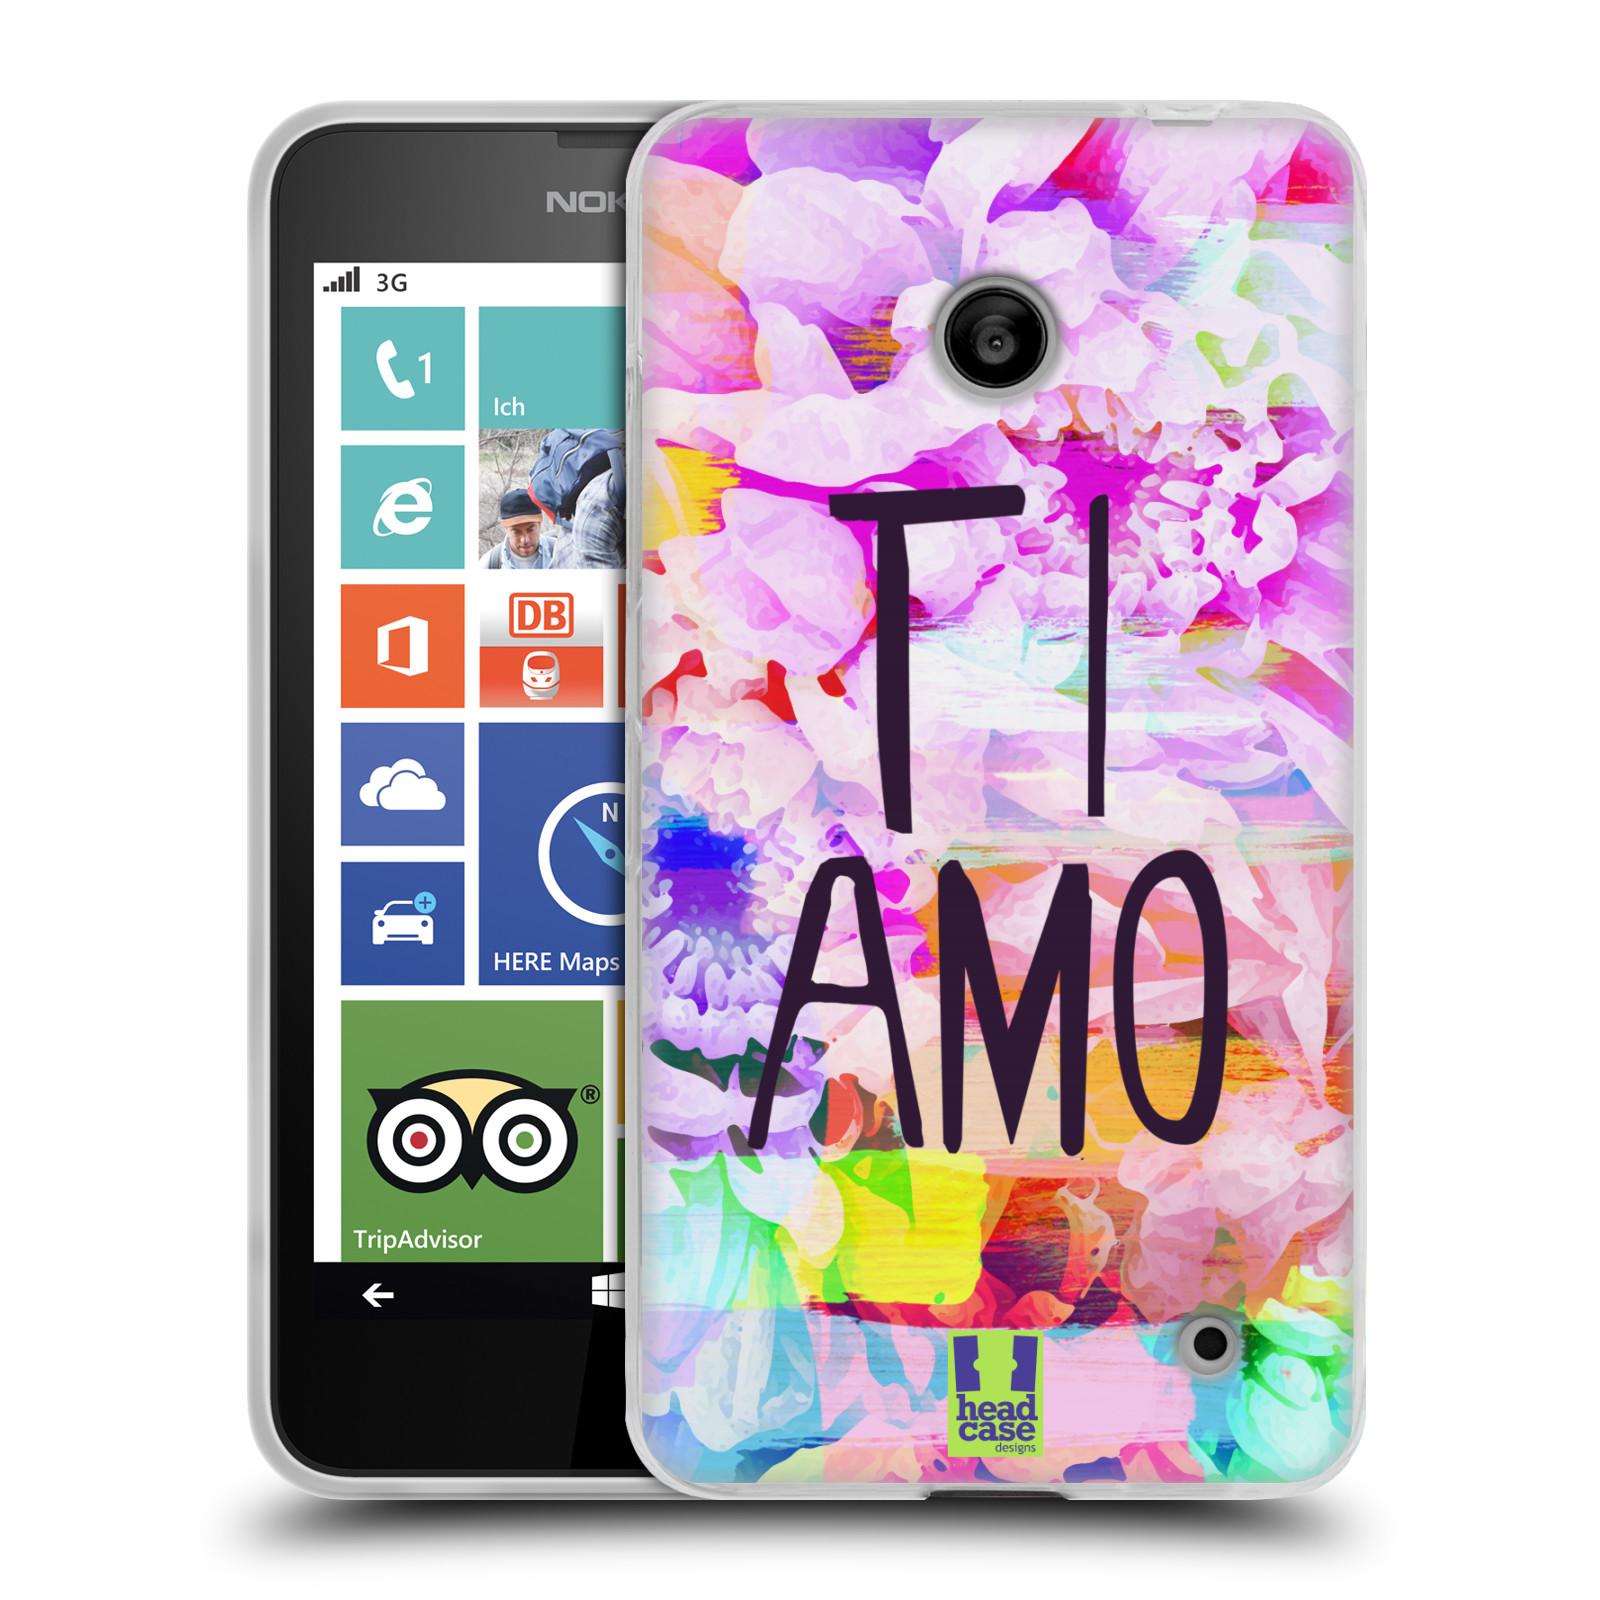 Silikonové pouzdro na mobil Nokia Lumia 630 HEAD CASE Květy Ti Amo (Silikonový kryt či obal na mobilní telefon Nokia Lumia 630 a Nokia Lumia 630 Dual SIM)